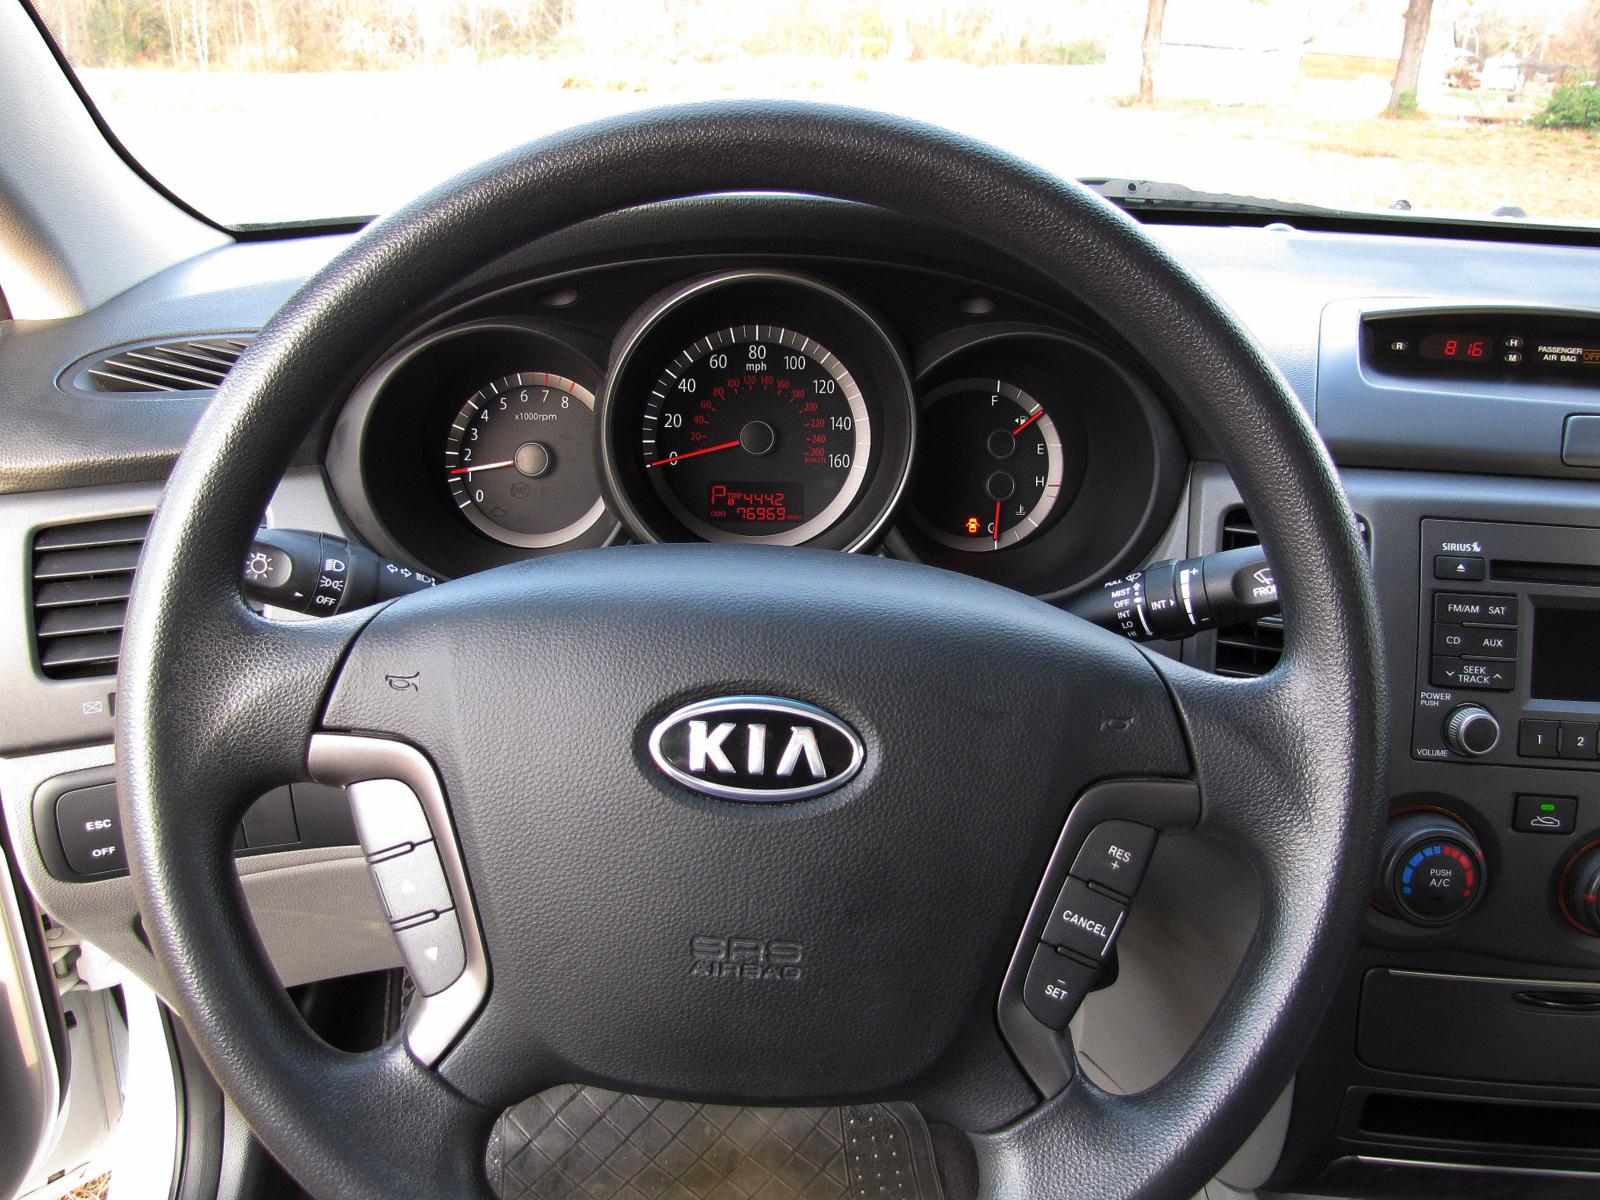 2010 Kia Optima